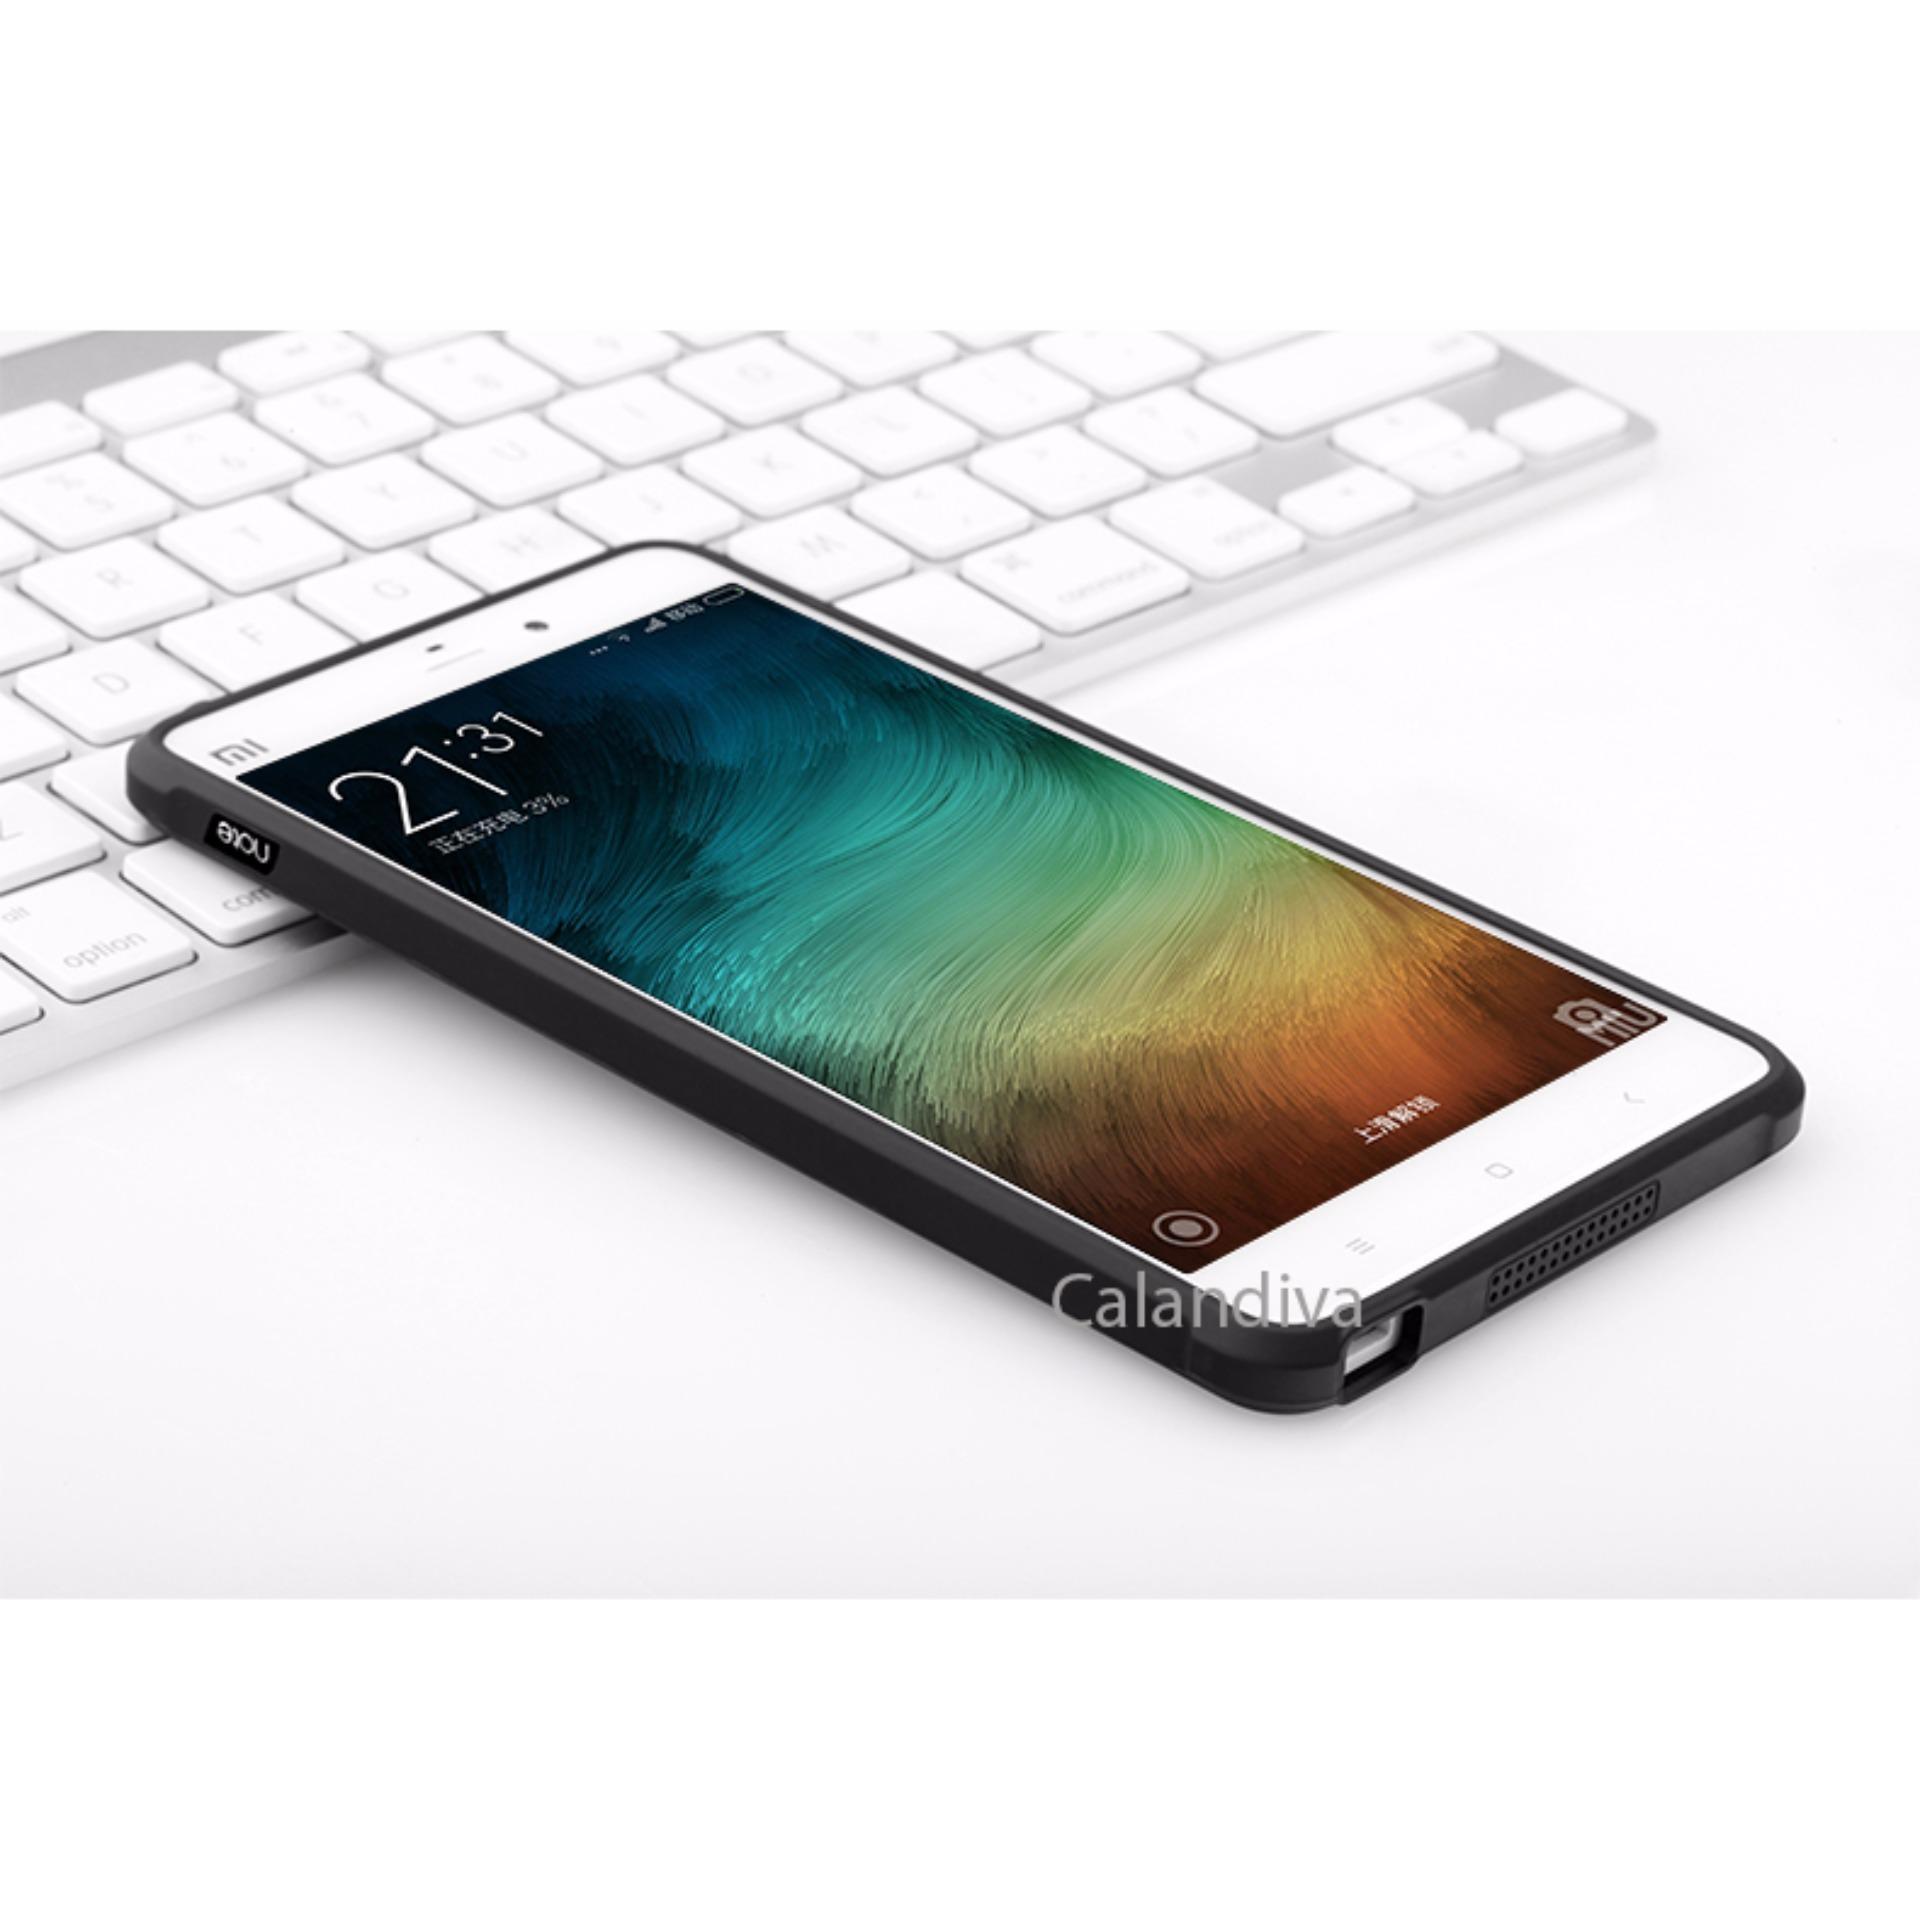 Calandiva Dragon Shockproof Hybrid Case for Xiaomi Mi Note Pro5 7 inch Hitam .